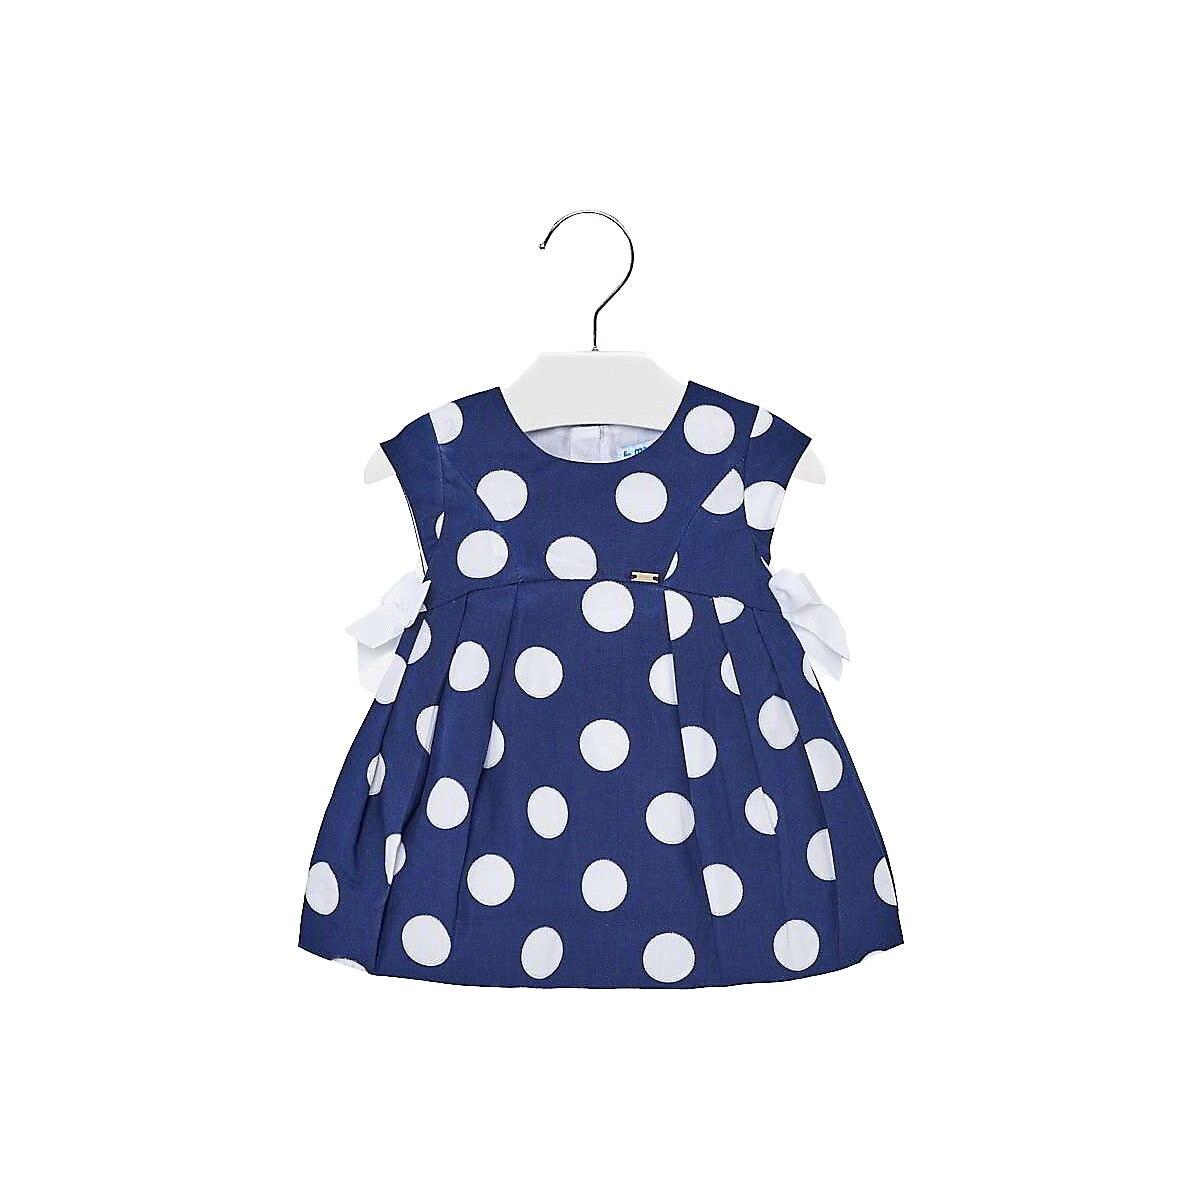 MAYORAL Dresses 10678674 dress for girls baby clothing fashion slim family long sleeve mesh dress for girls